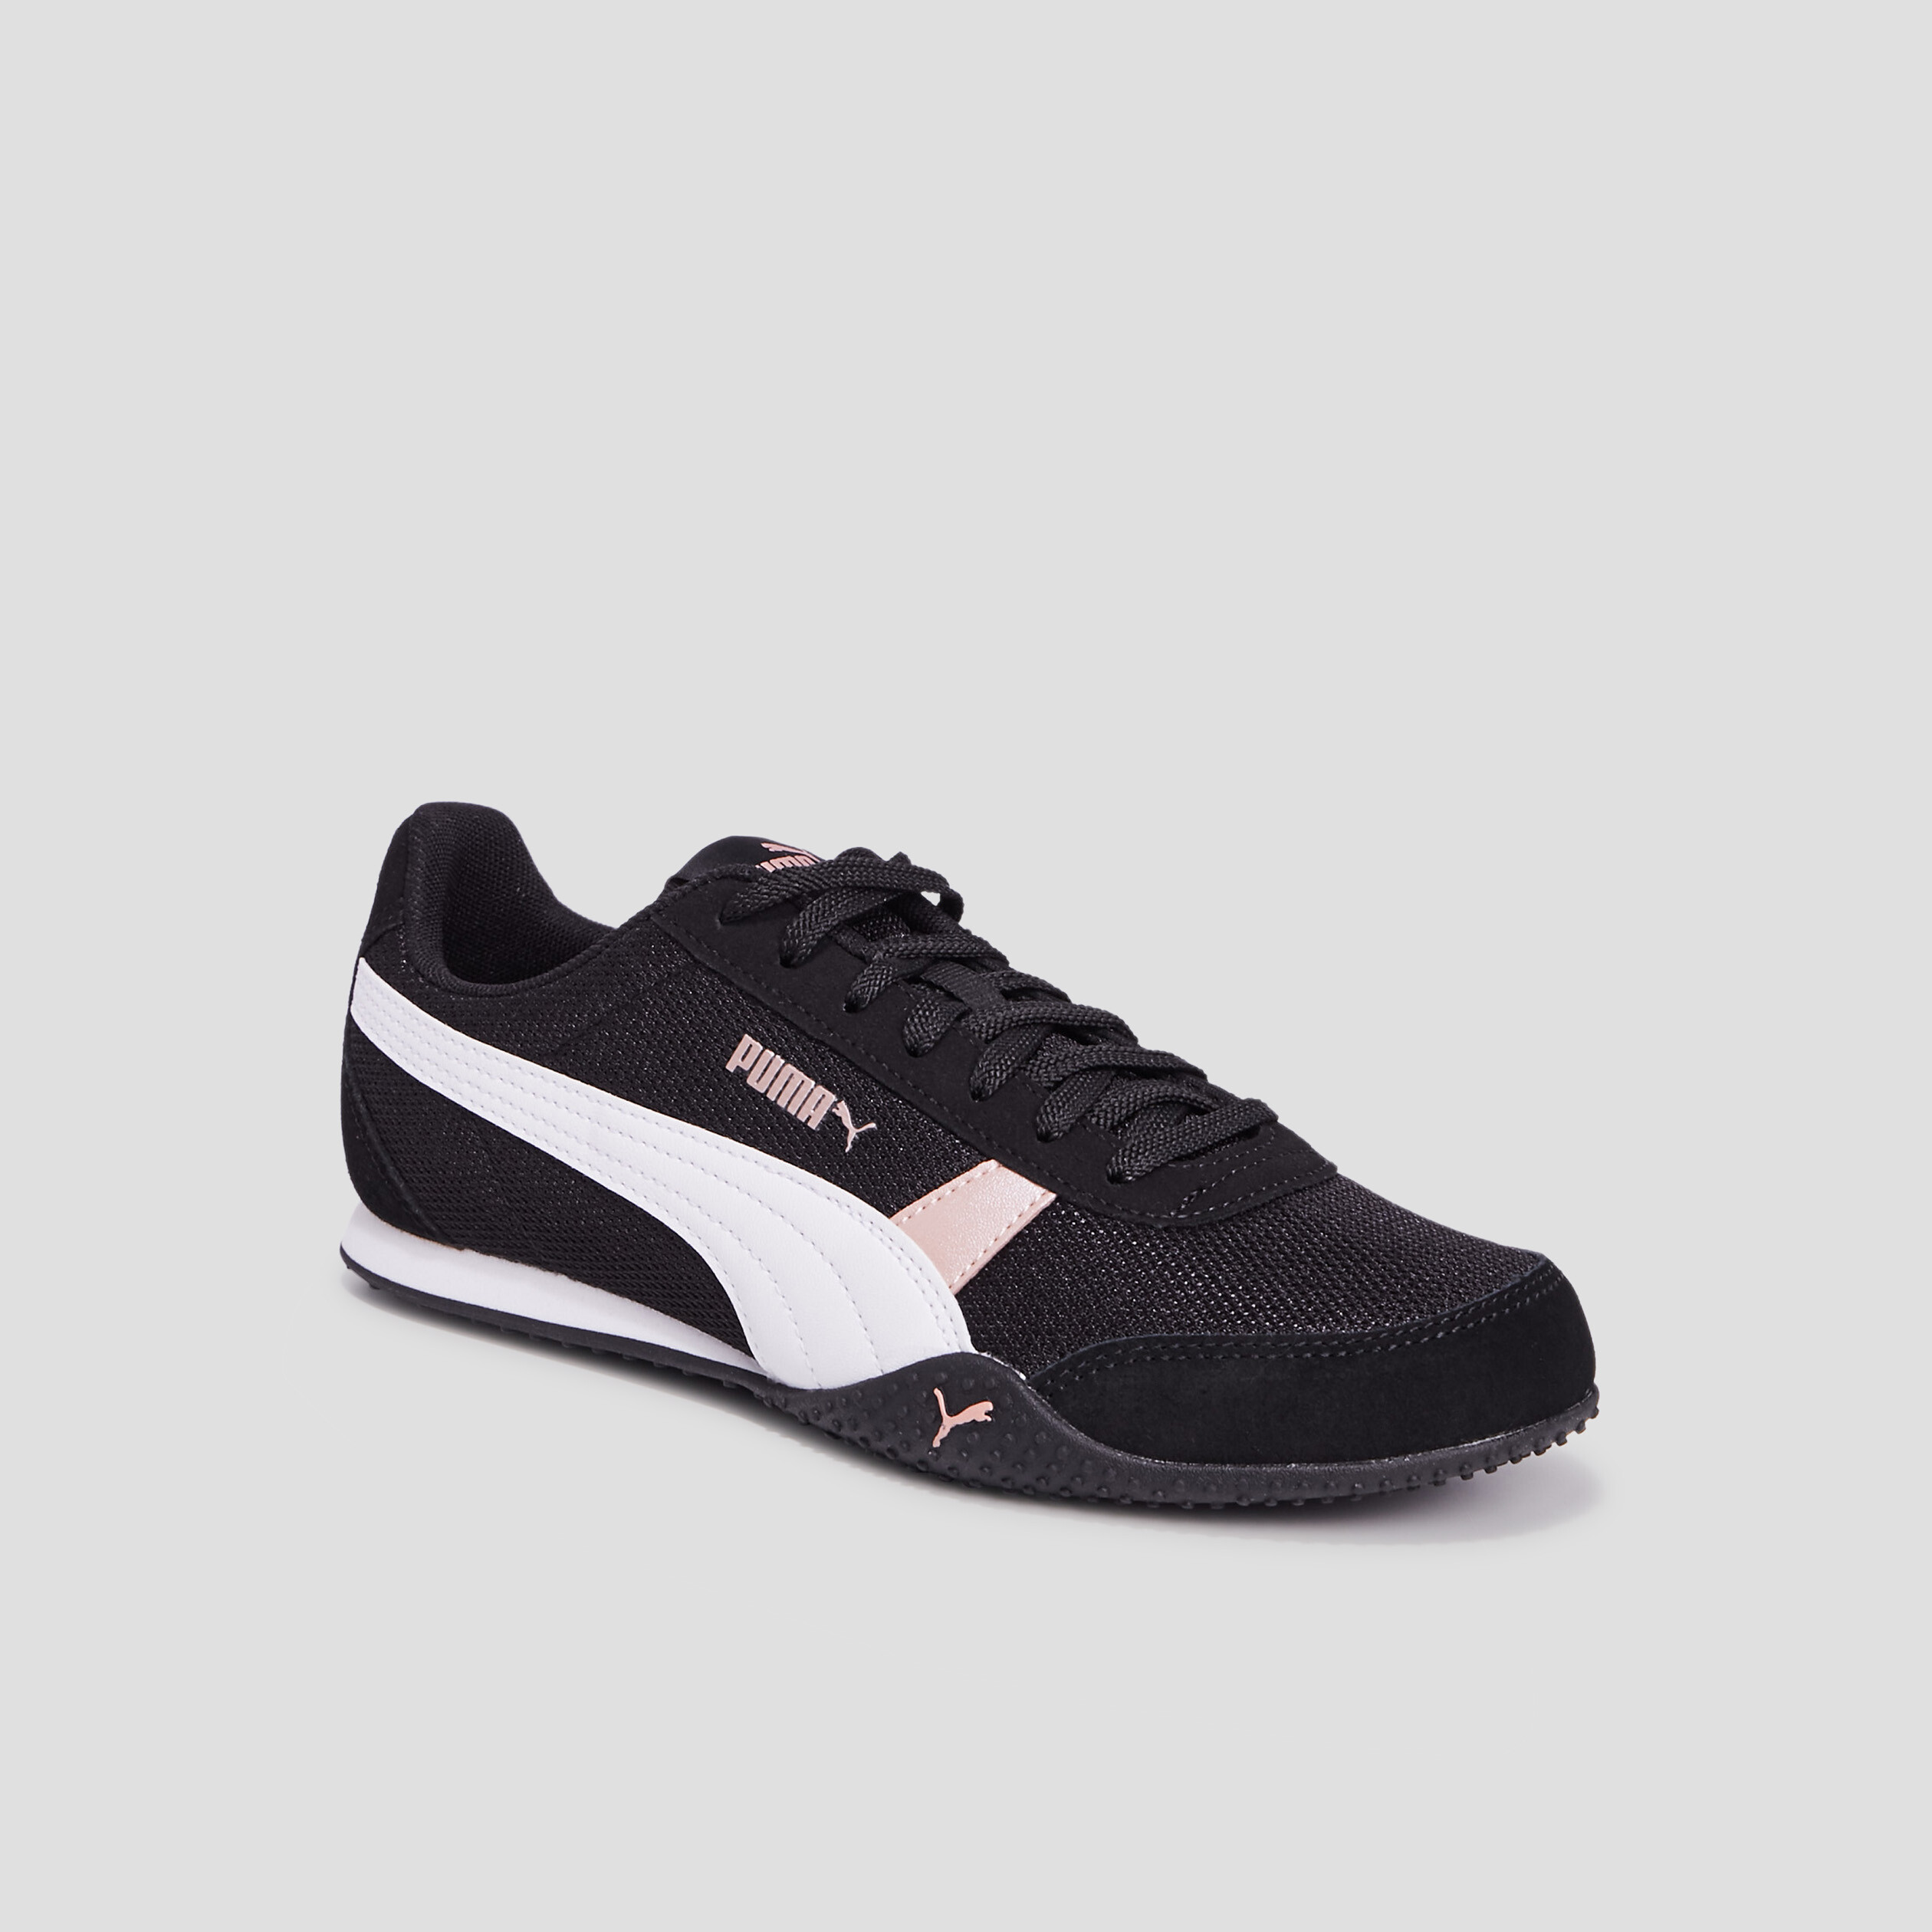 Runnings Puma femme noir | La Halle